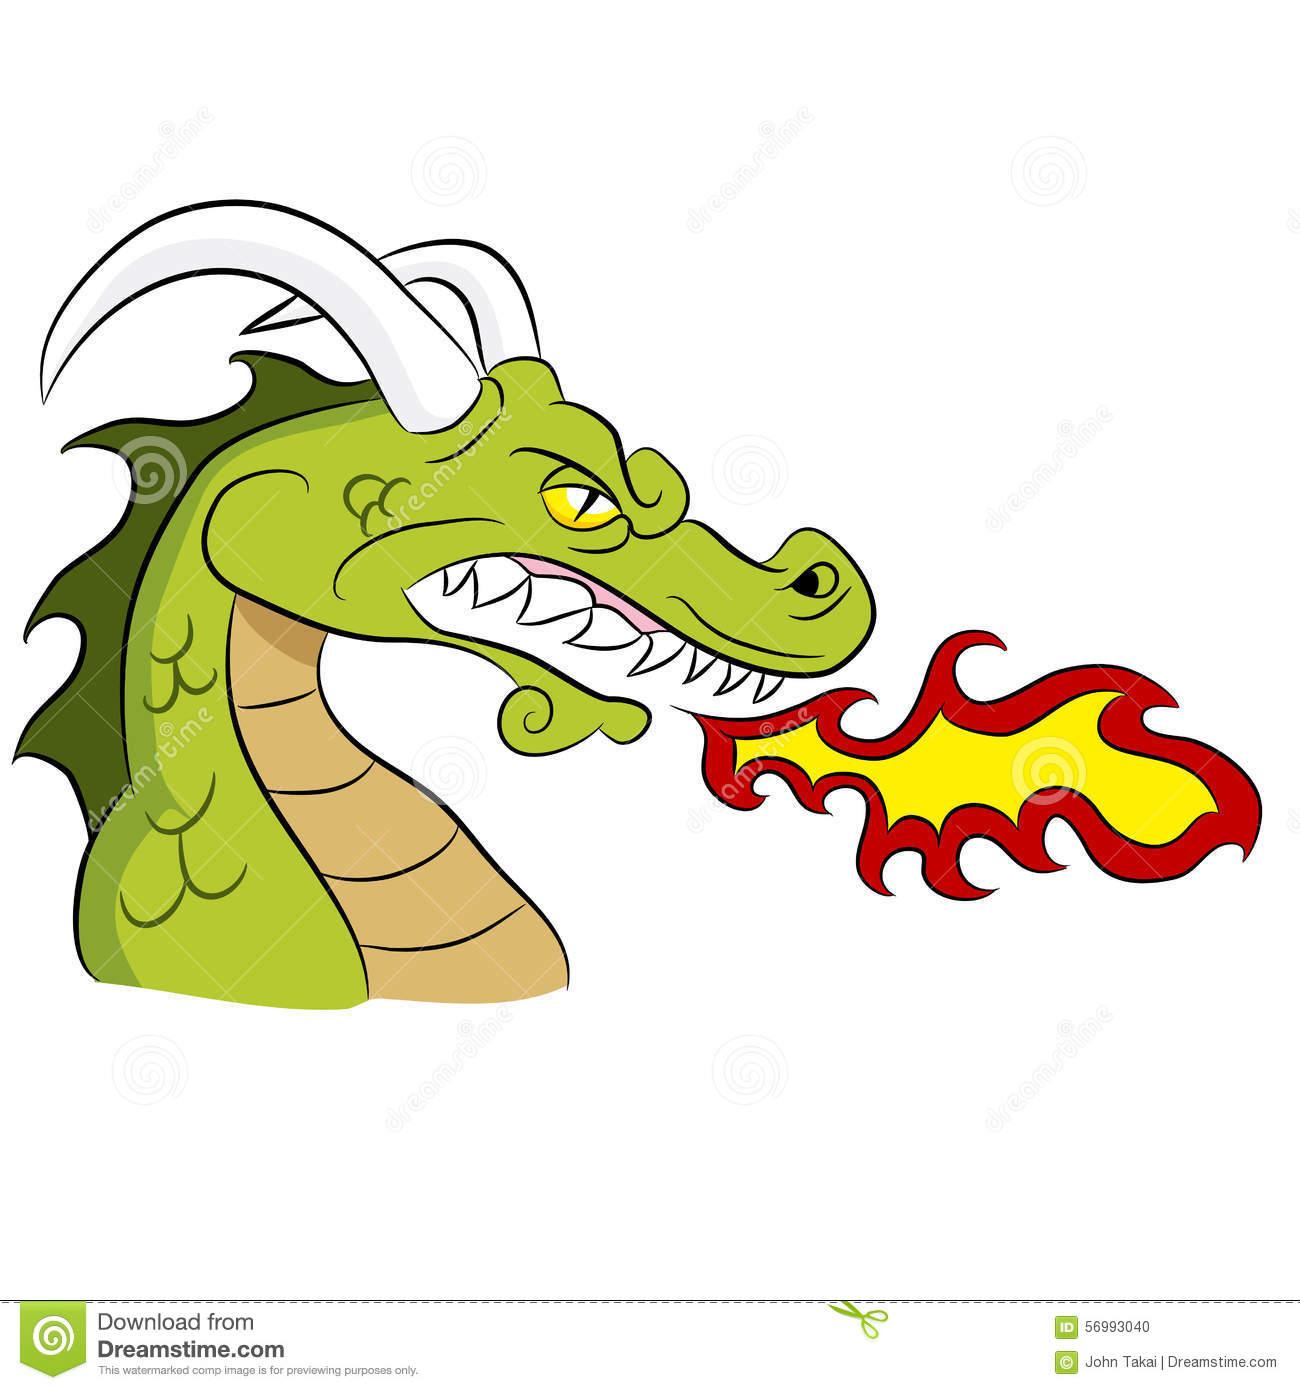 Breath clipart cartoon.  collection of dragon